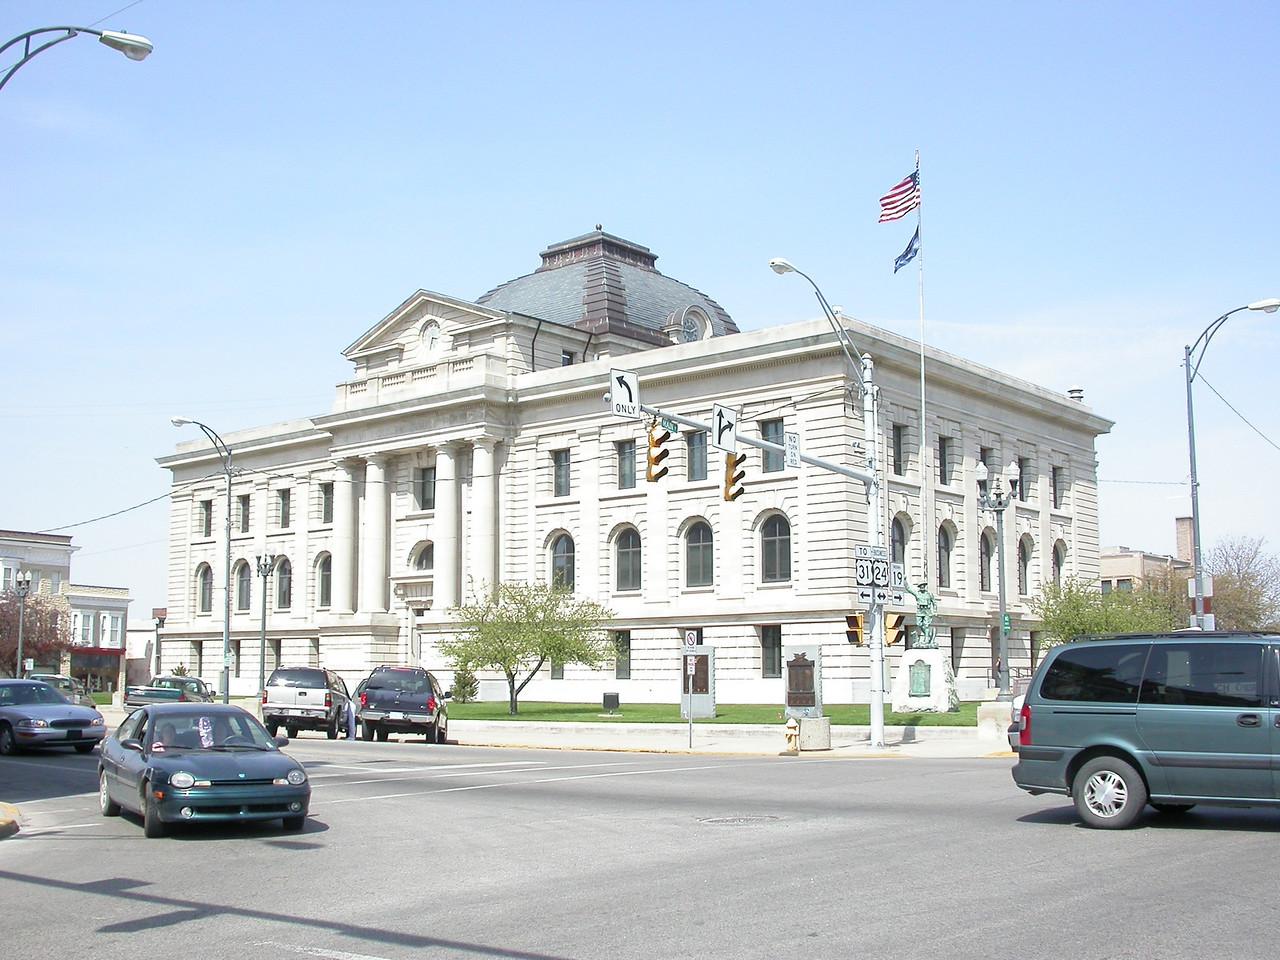 Miami County Indiana Courthouse, Peru, Indiana, April 2004